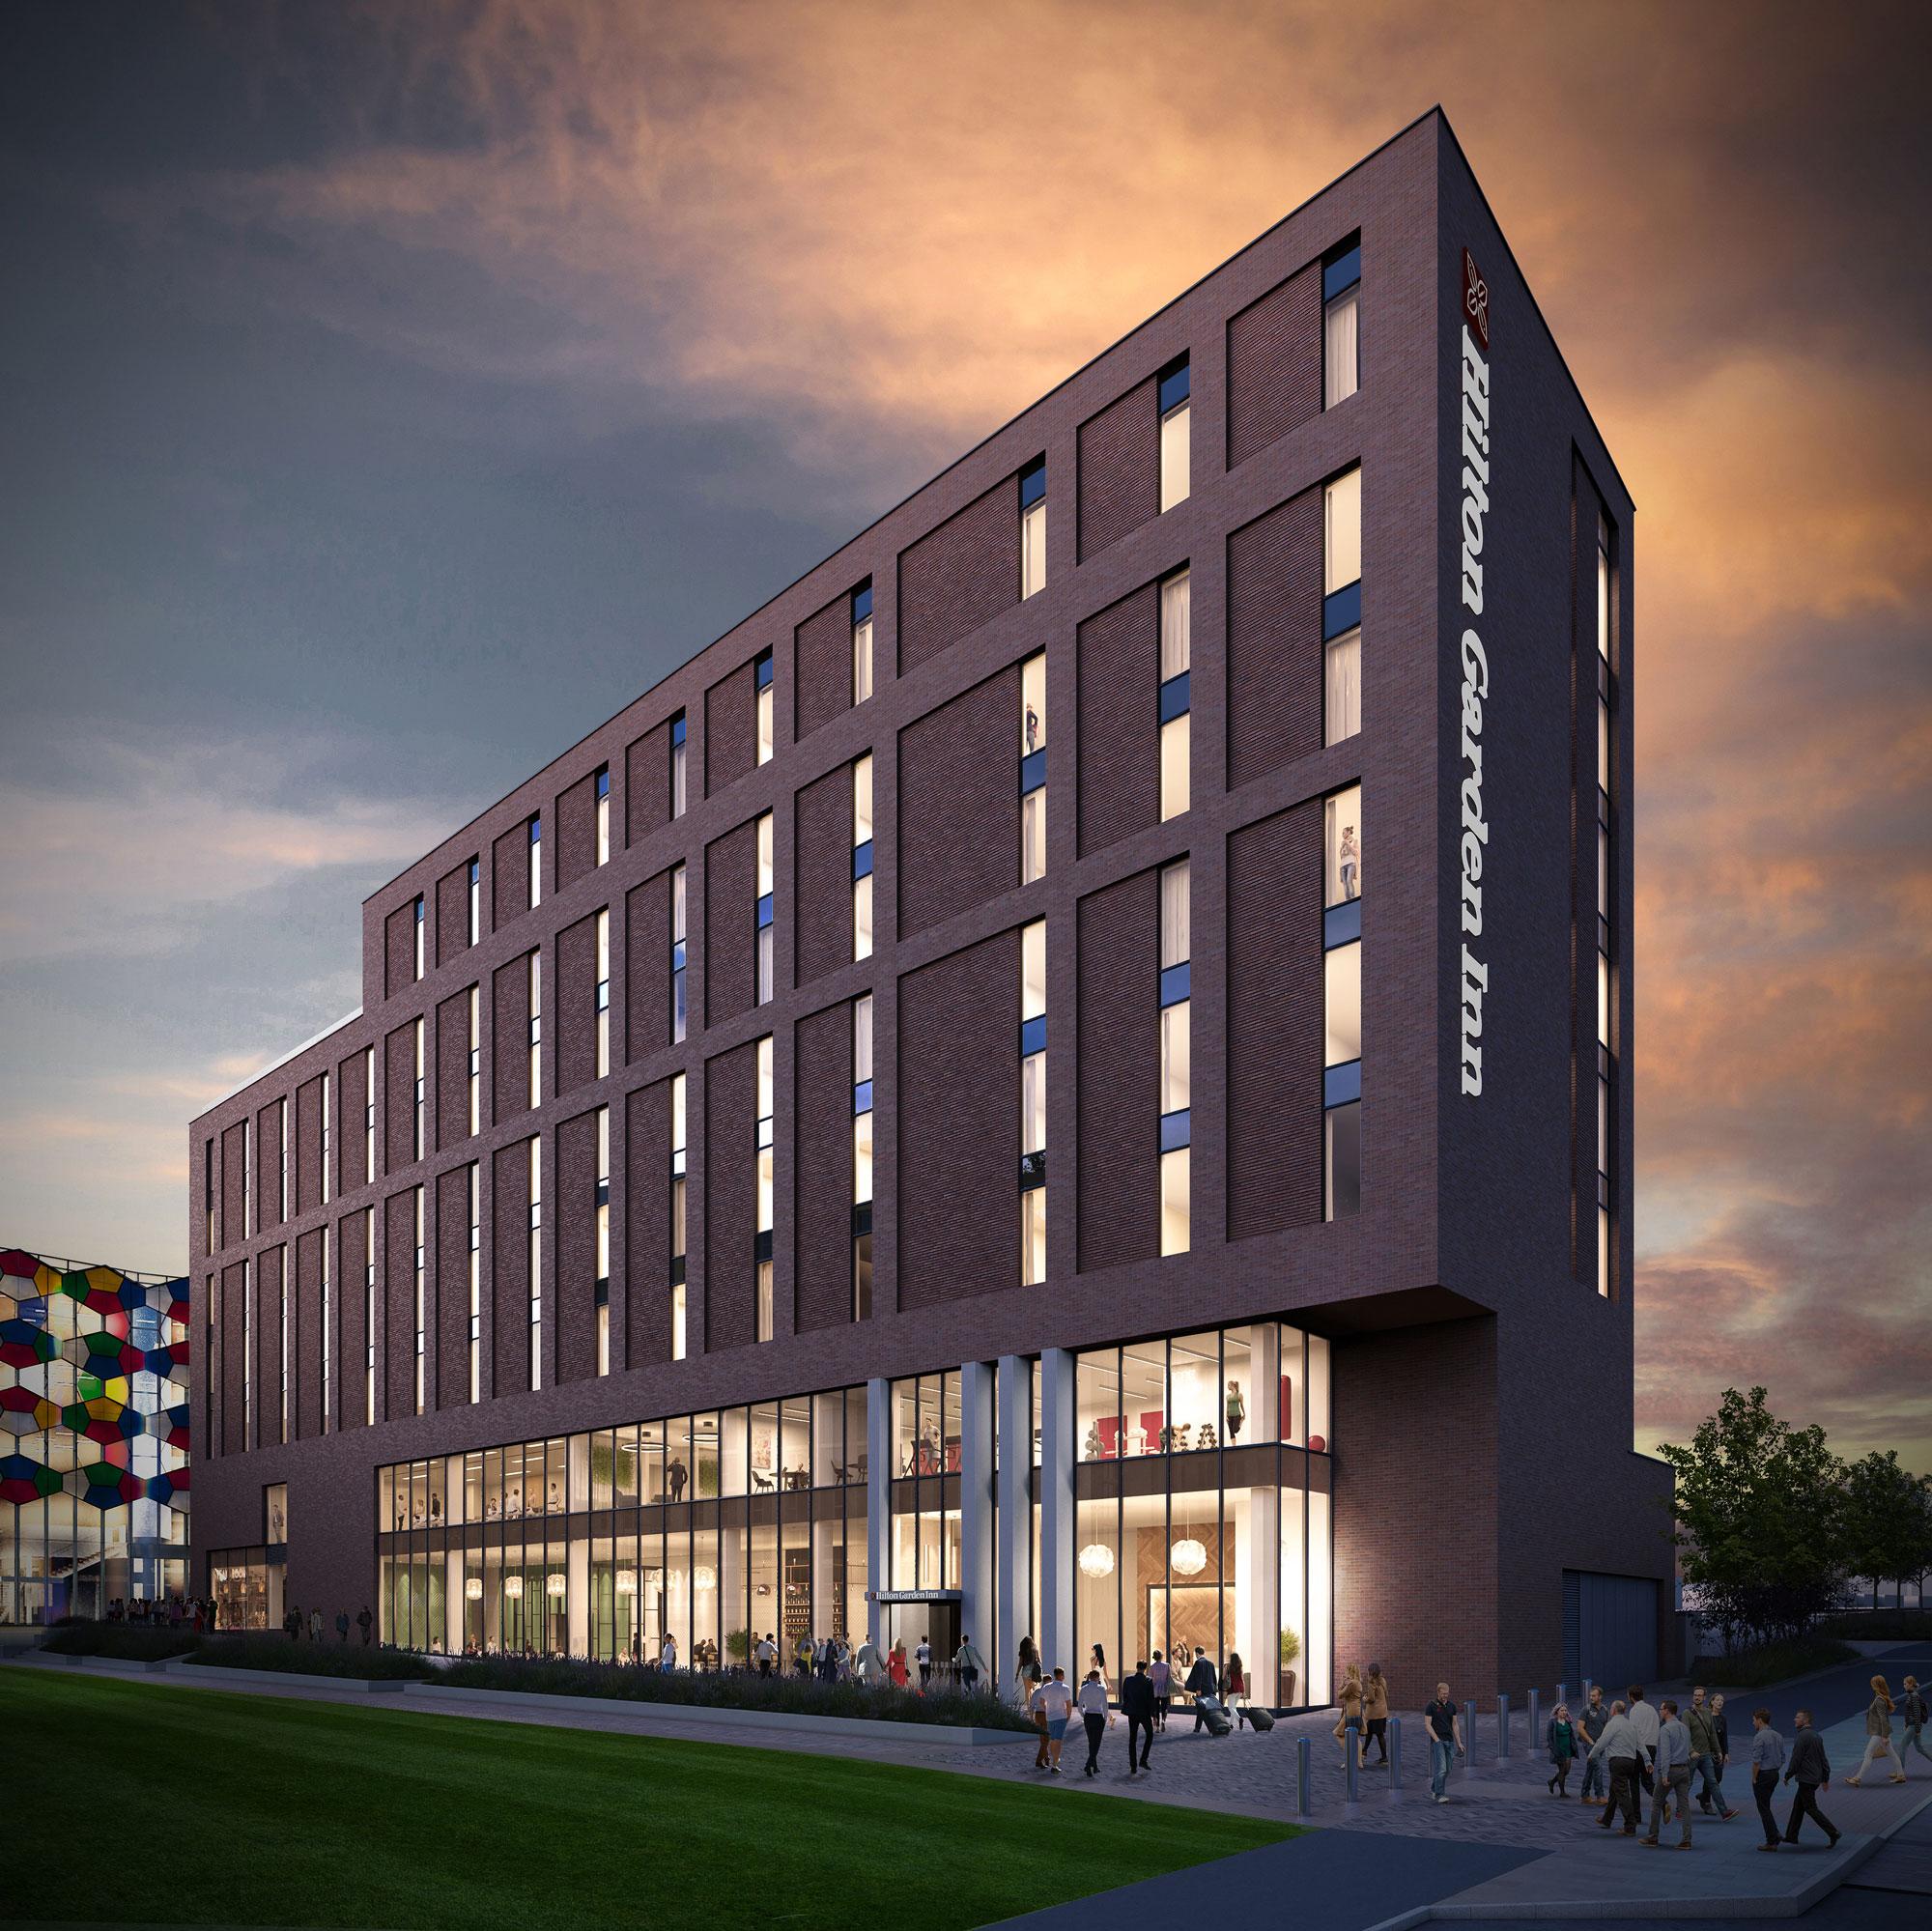 Hilton Garden Inn Signs At Genr8 S Smithfield Stoke On